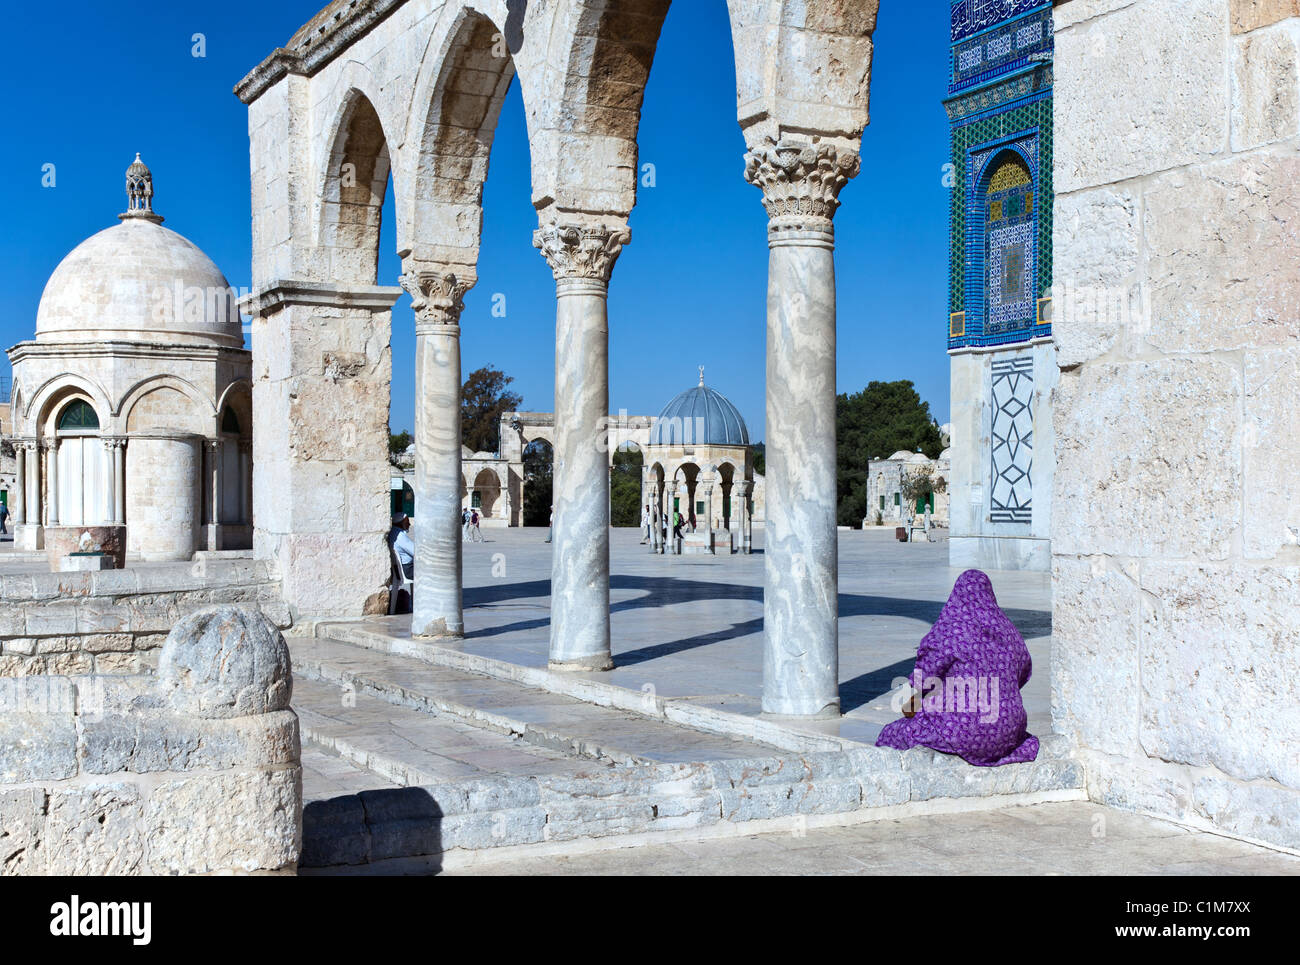 Israel, Jerusalem, a gateway to the Temple Mount (Har Habait) - Stock Image